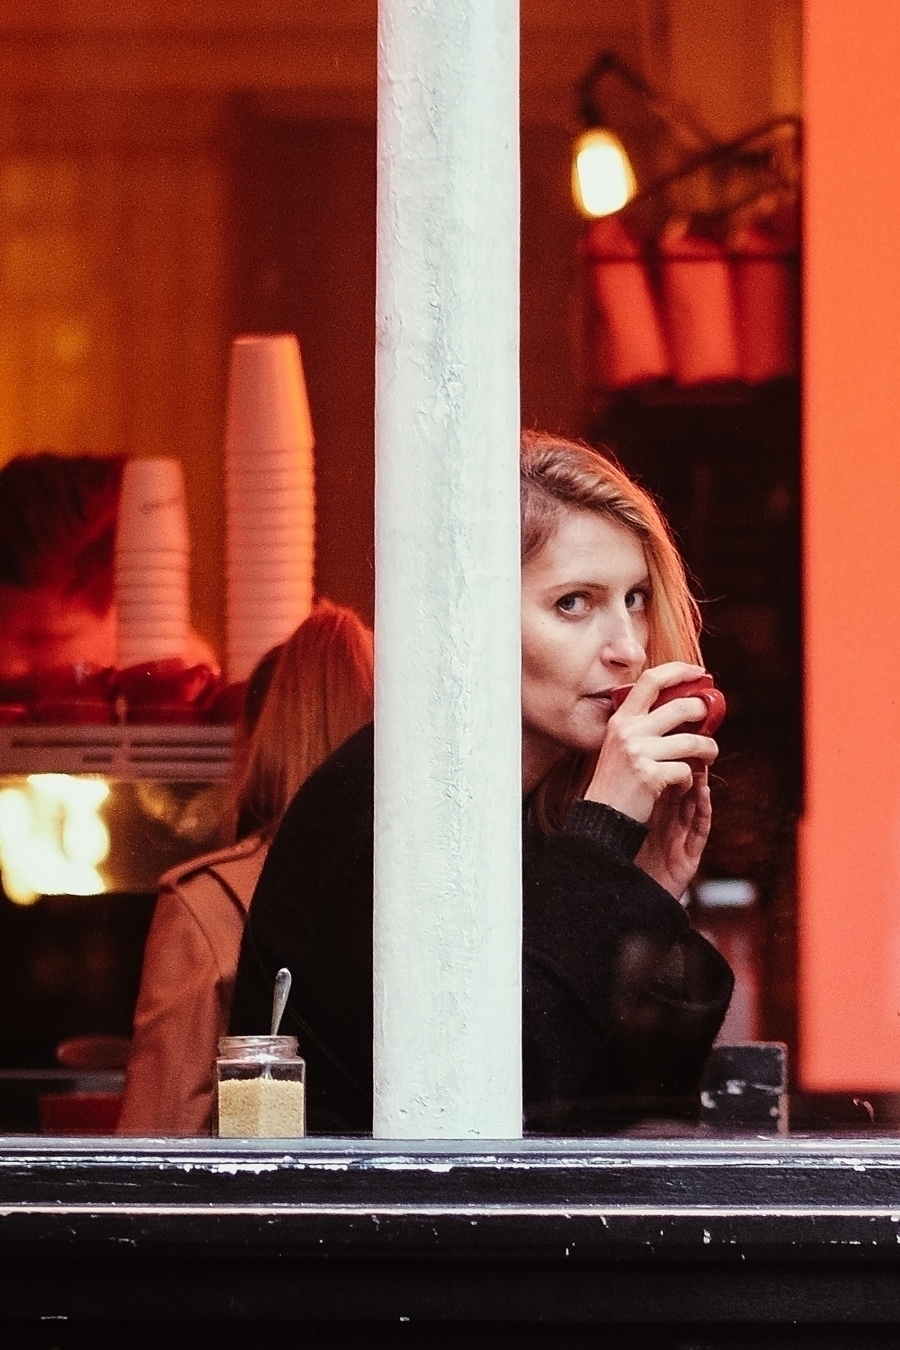 Beak Street, London - photography - heroesforsale | ello